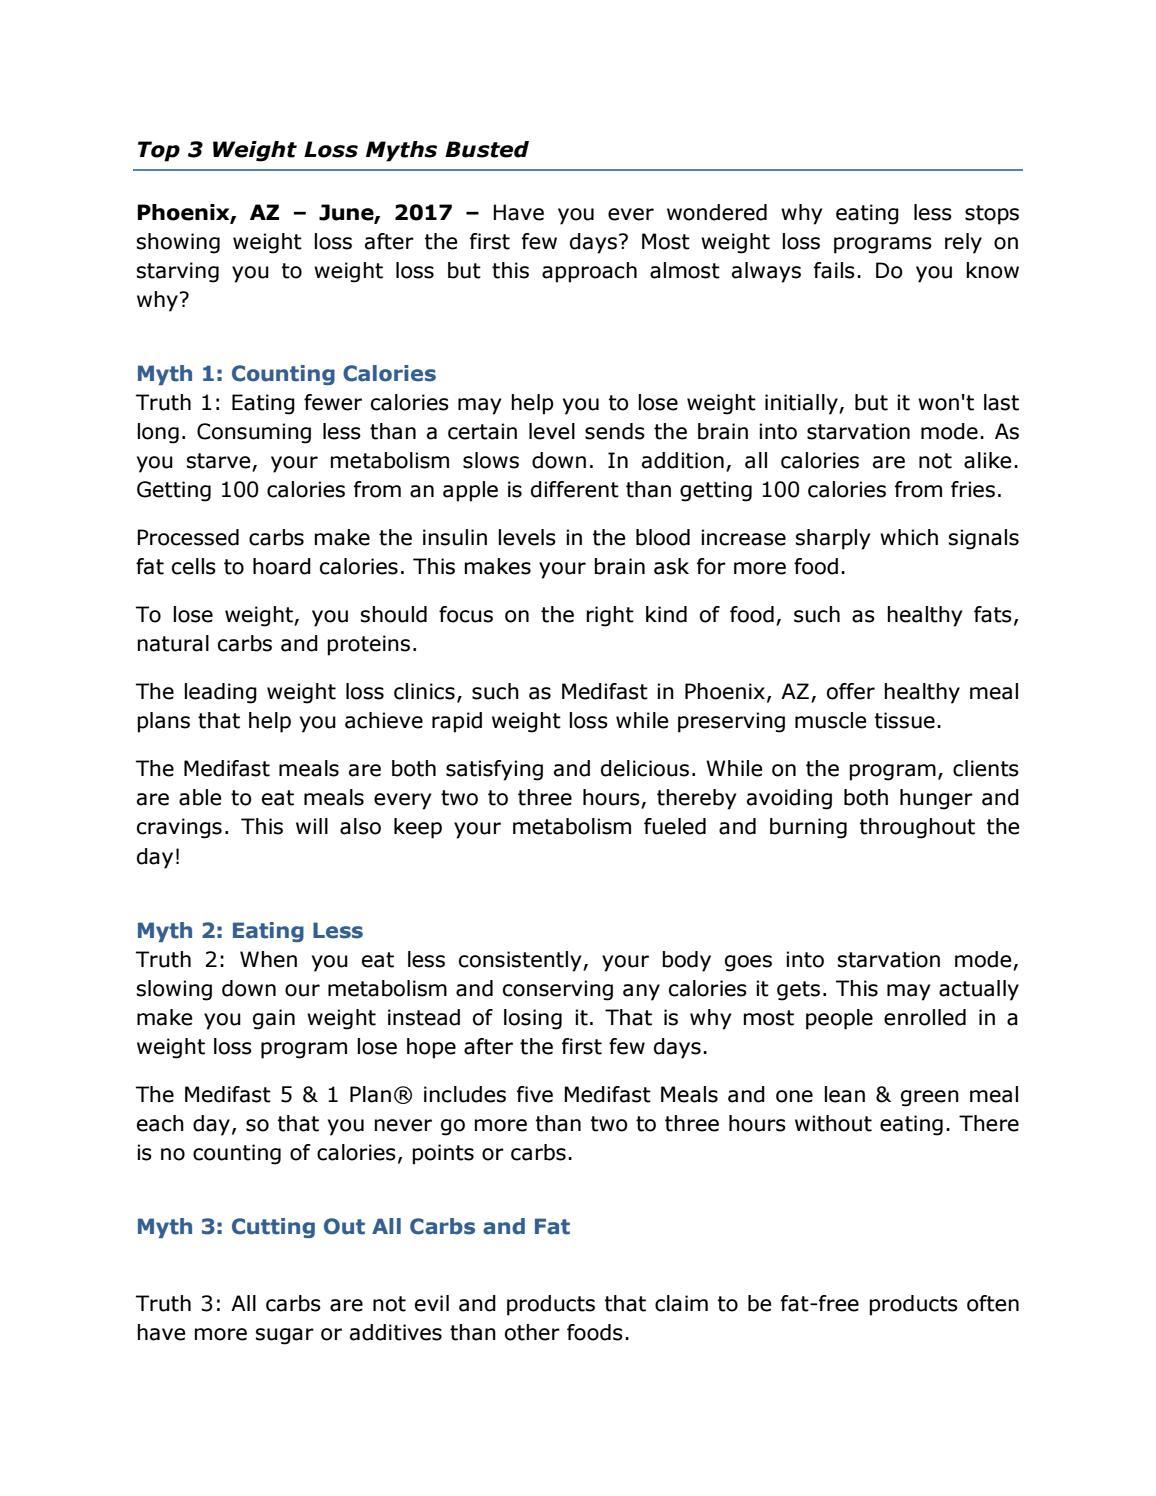 90 day diet plans - Suzen rabionetassociats com